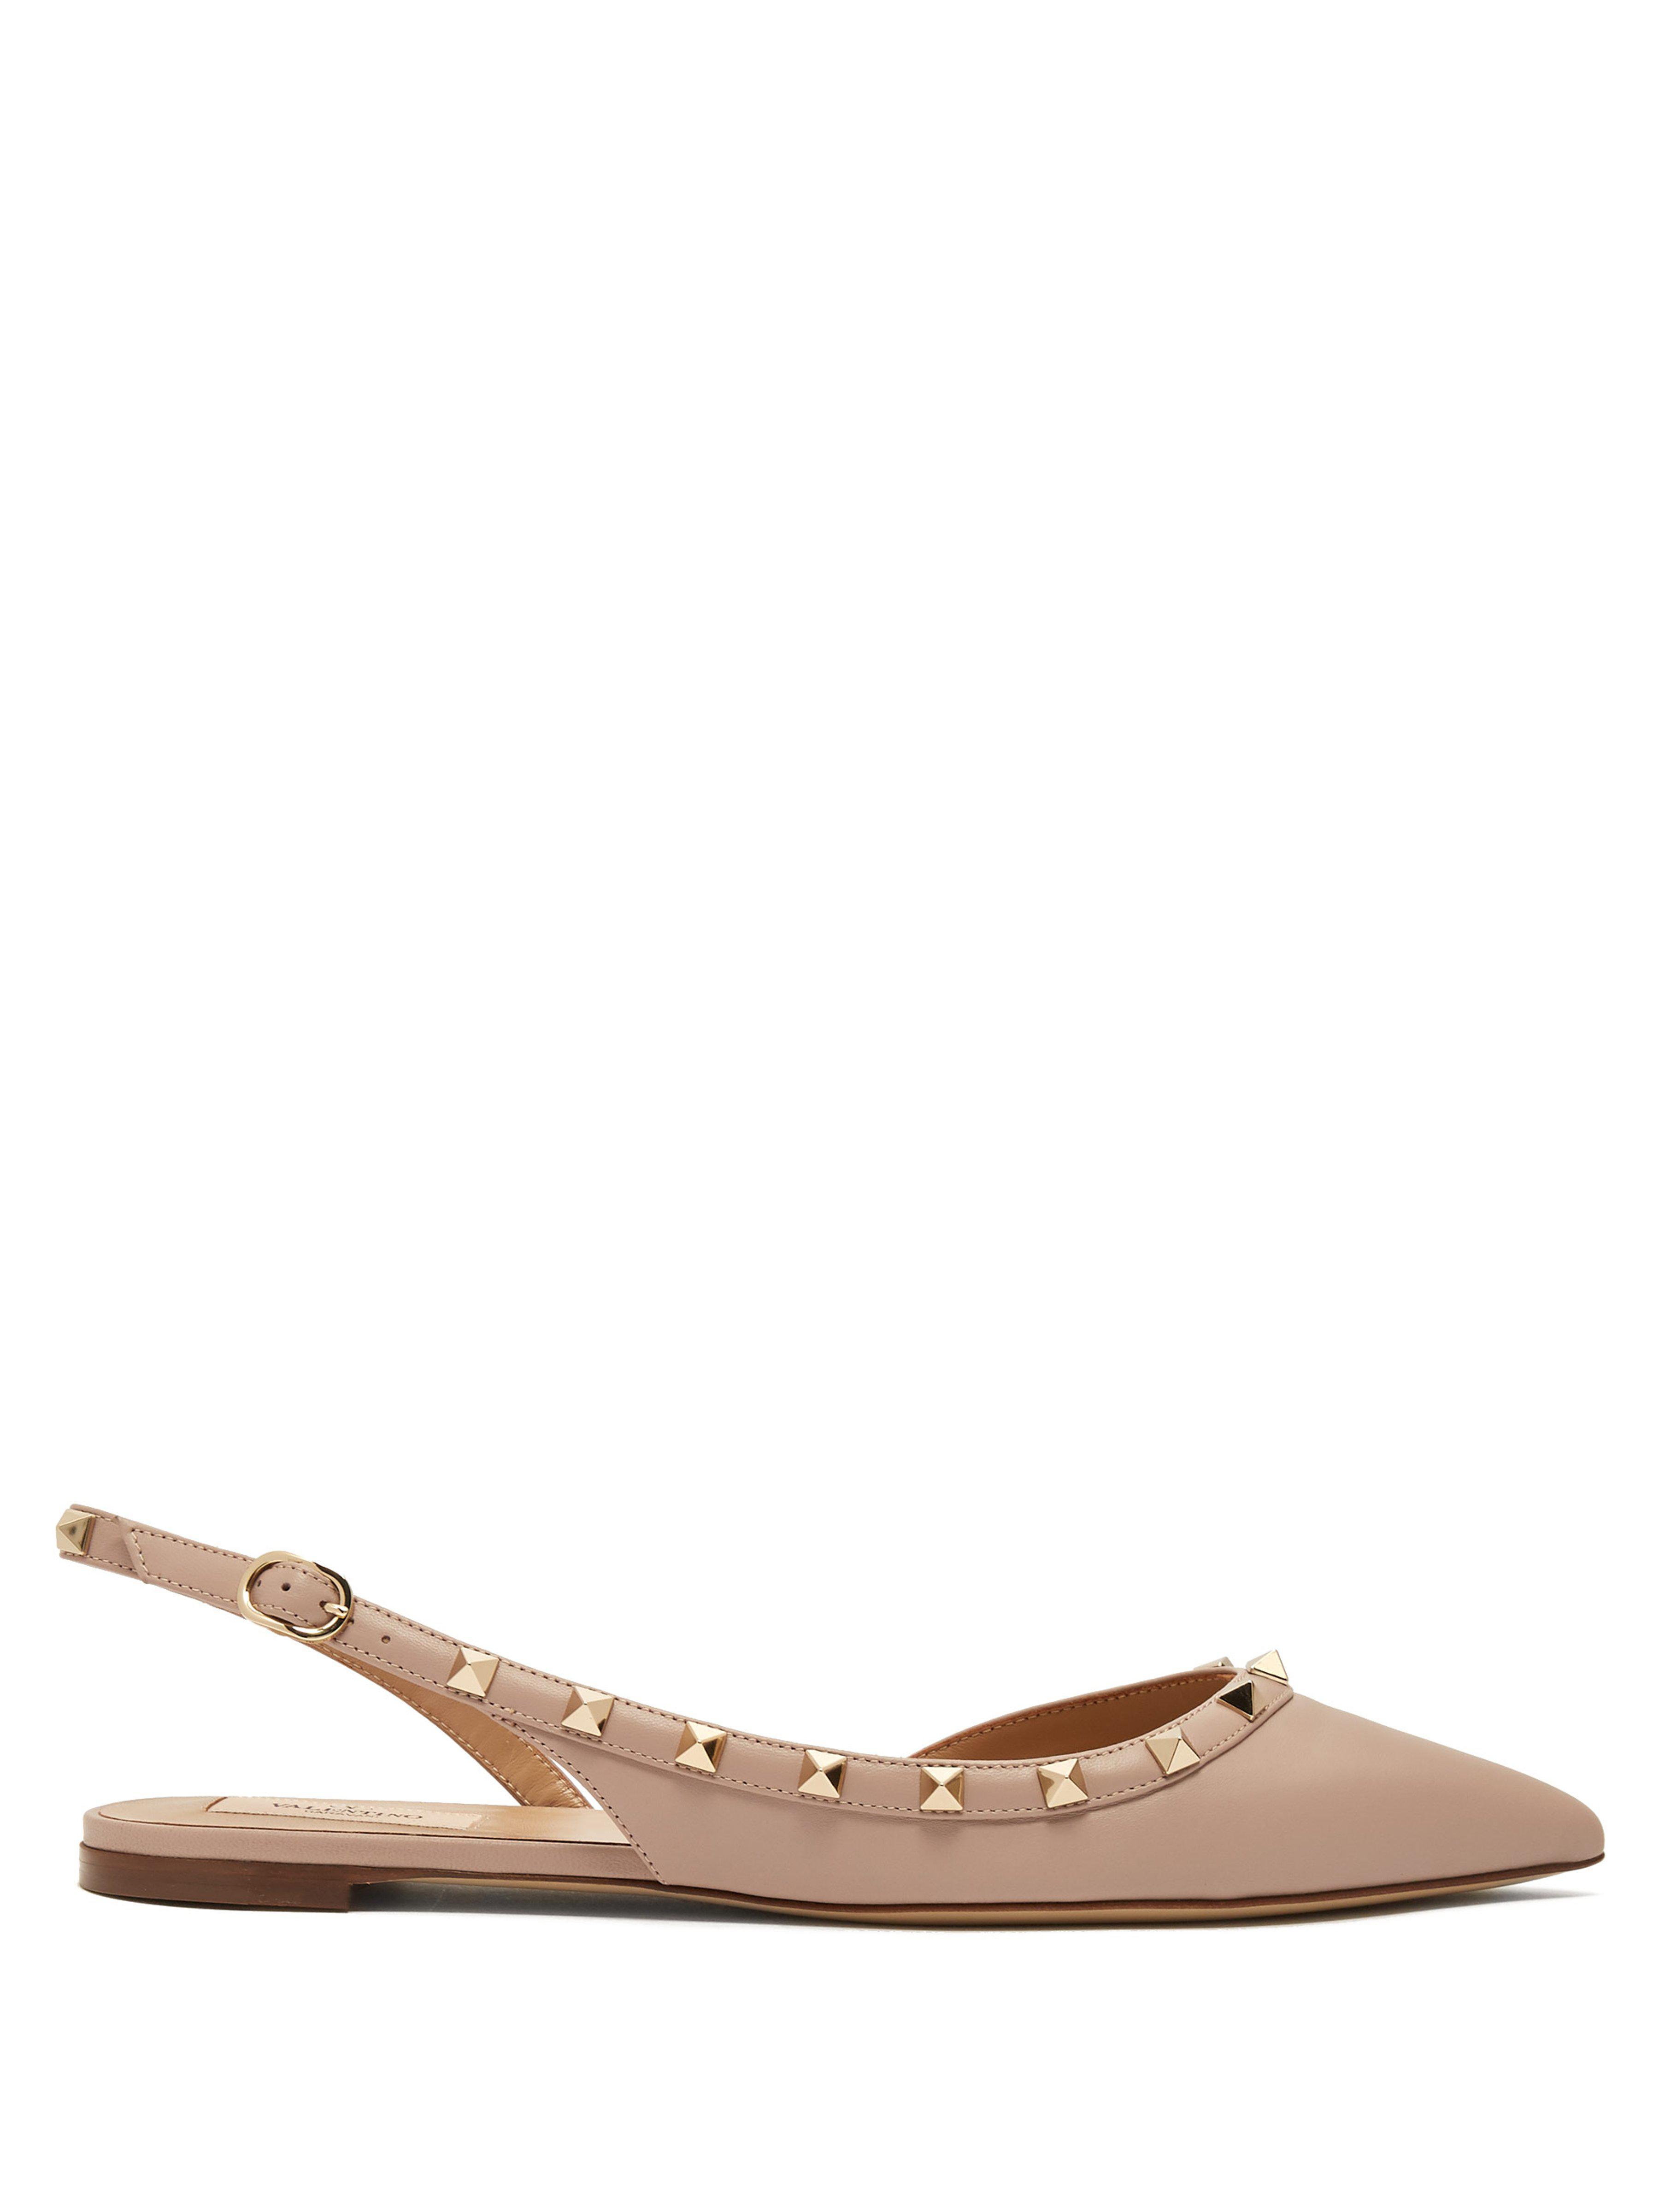 037ec6079cc8 Valentino Rockstud Leather Slingback Ballet Flats - Save 17% - Lyst